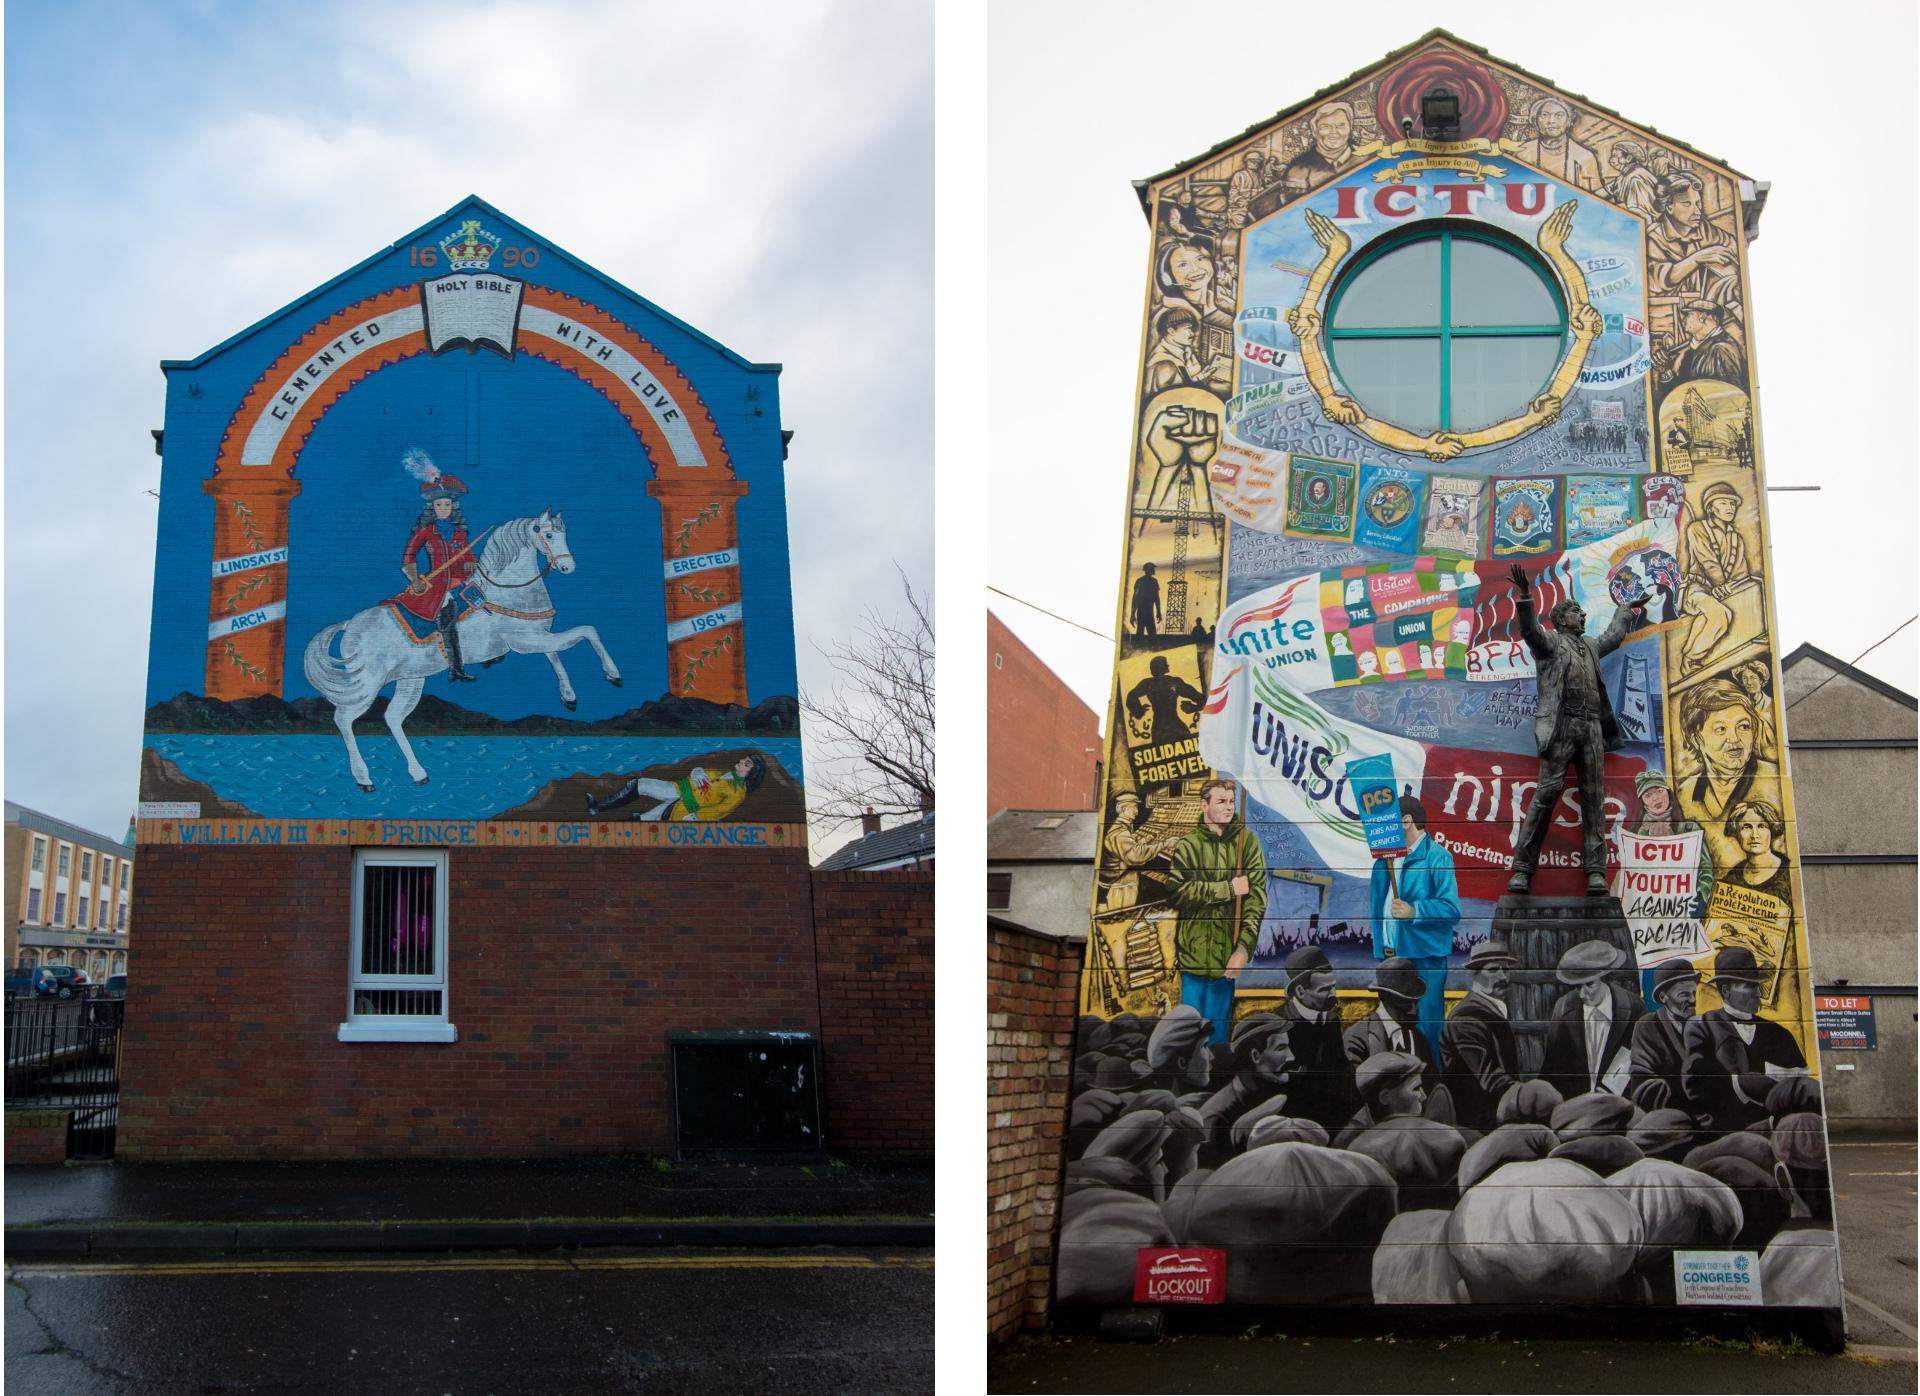 belfast-street-art-political-graffiti-on-buildings